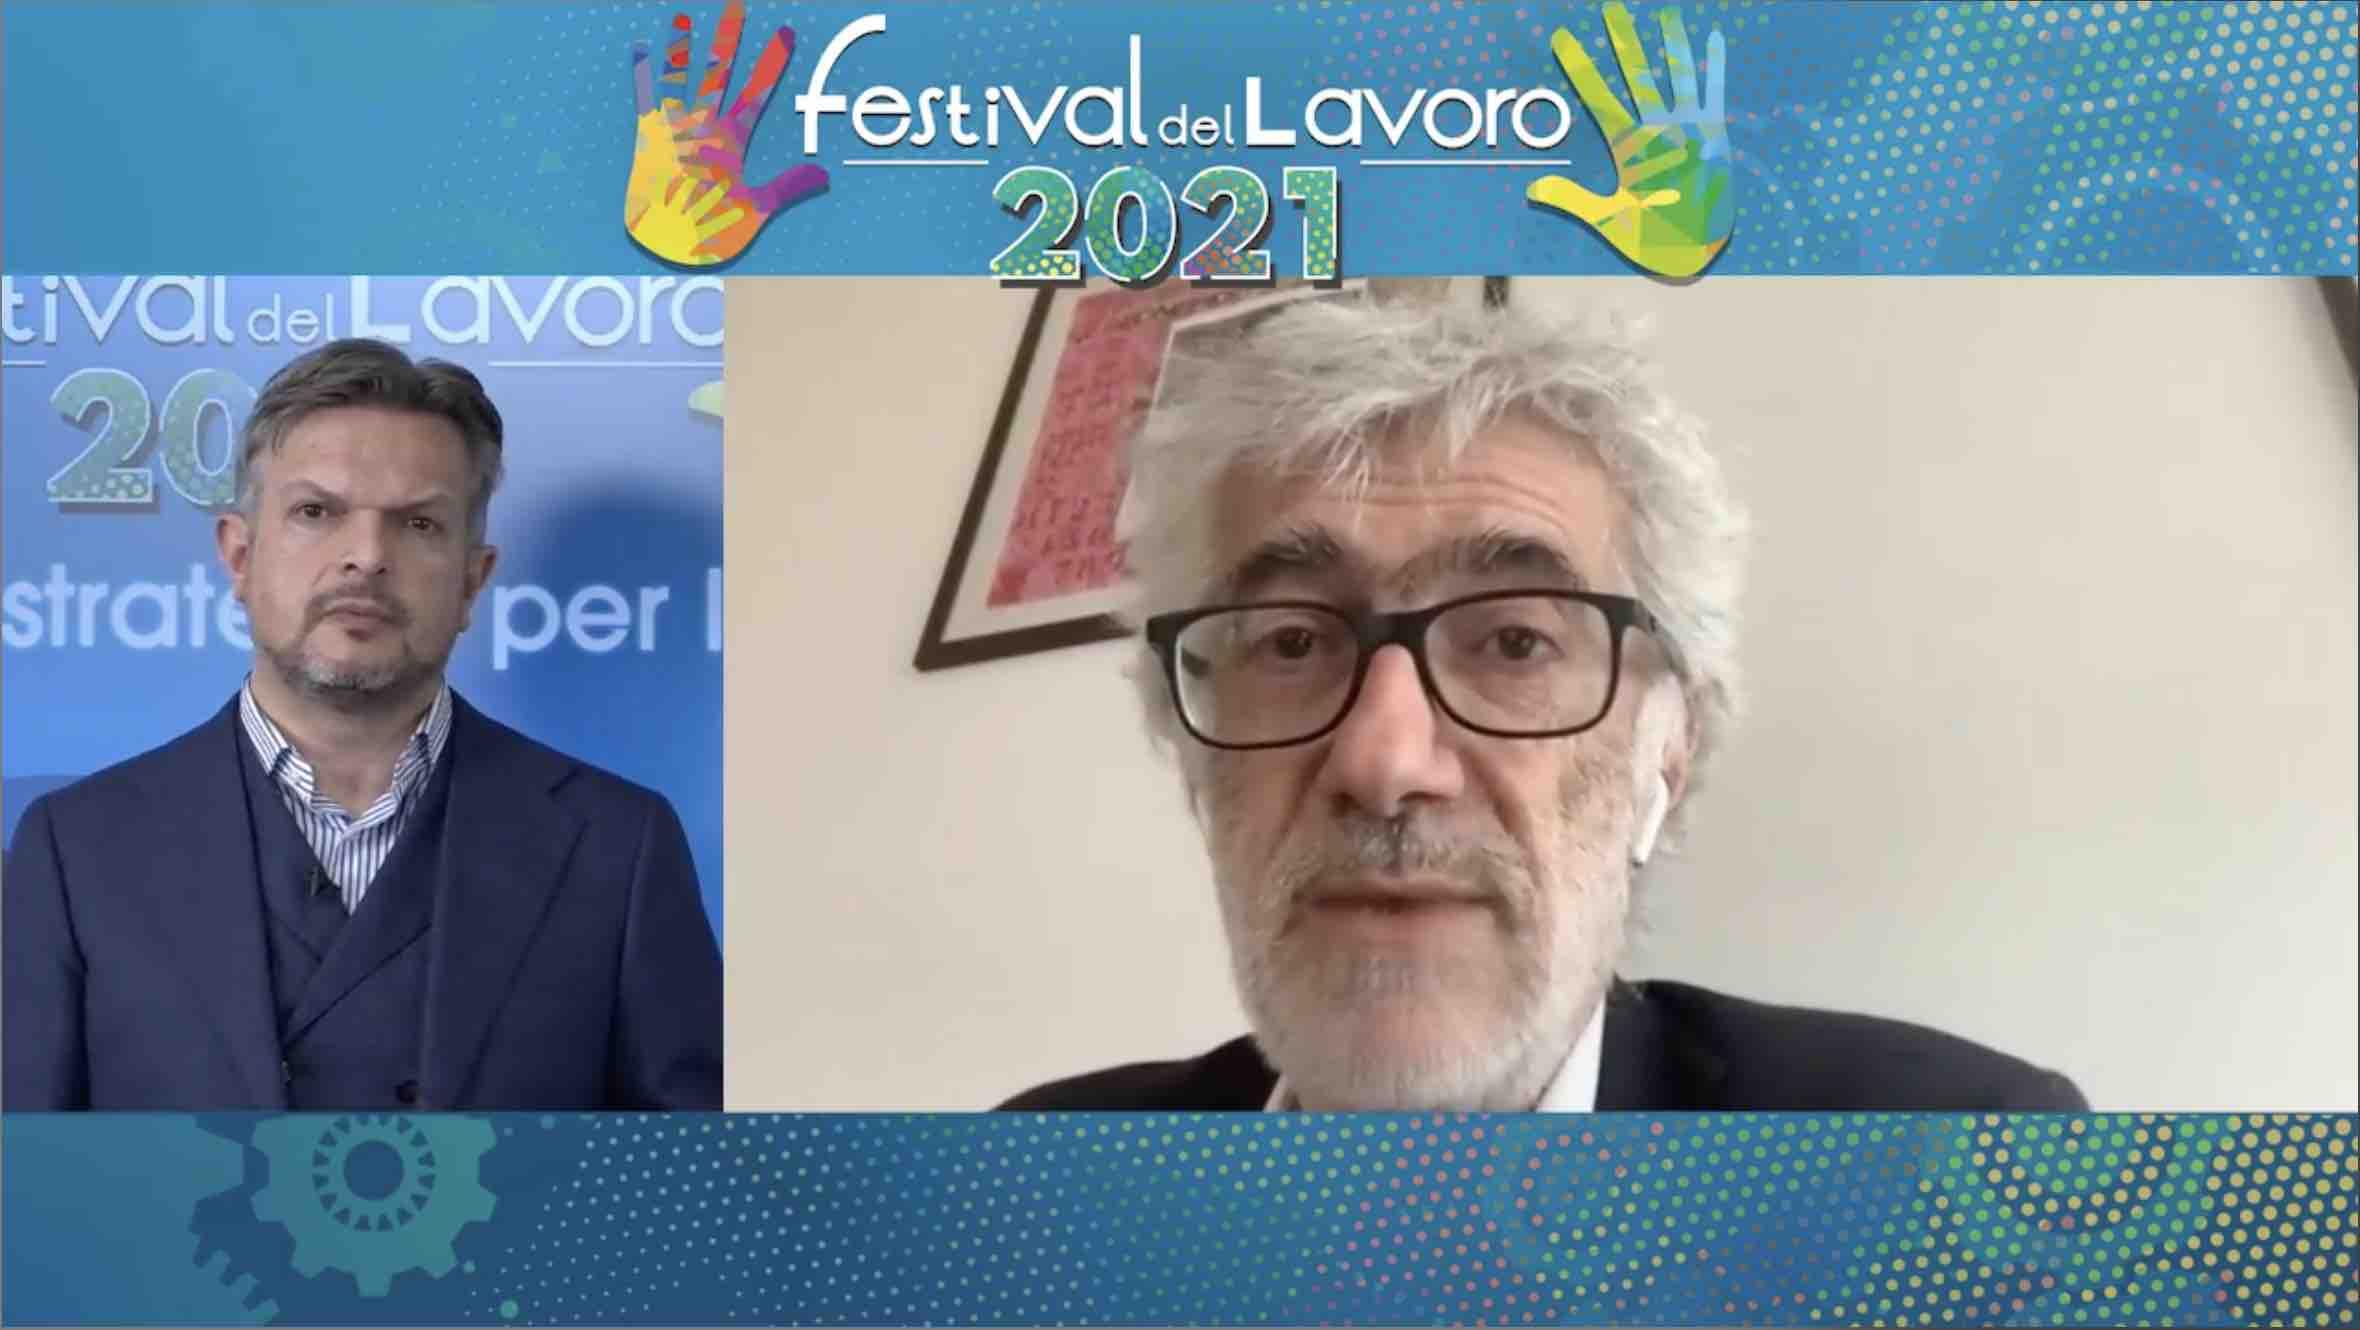 Intervista al giornalista Luca De Biase